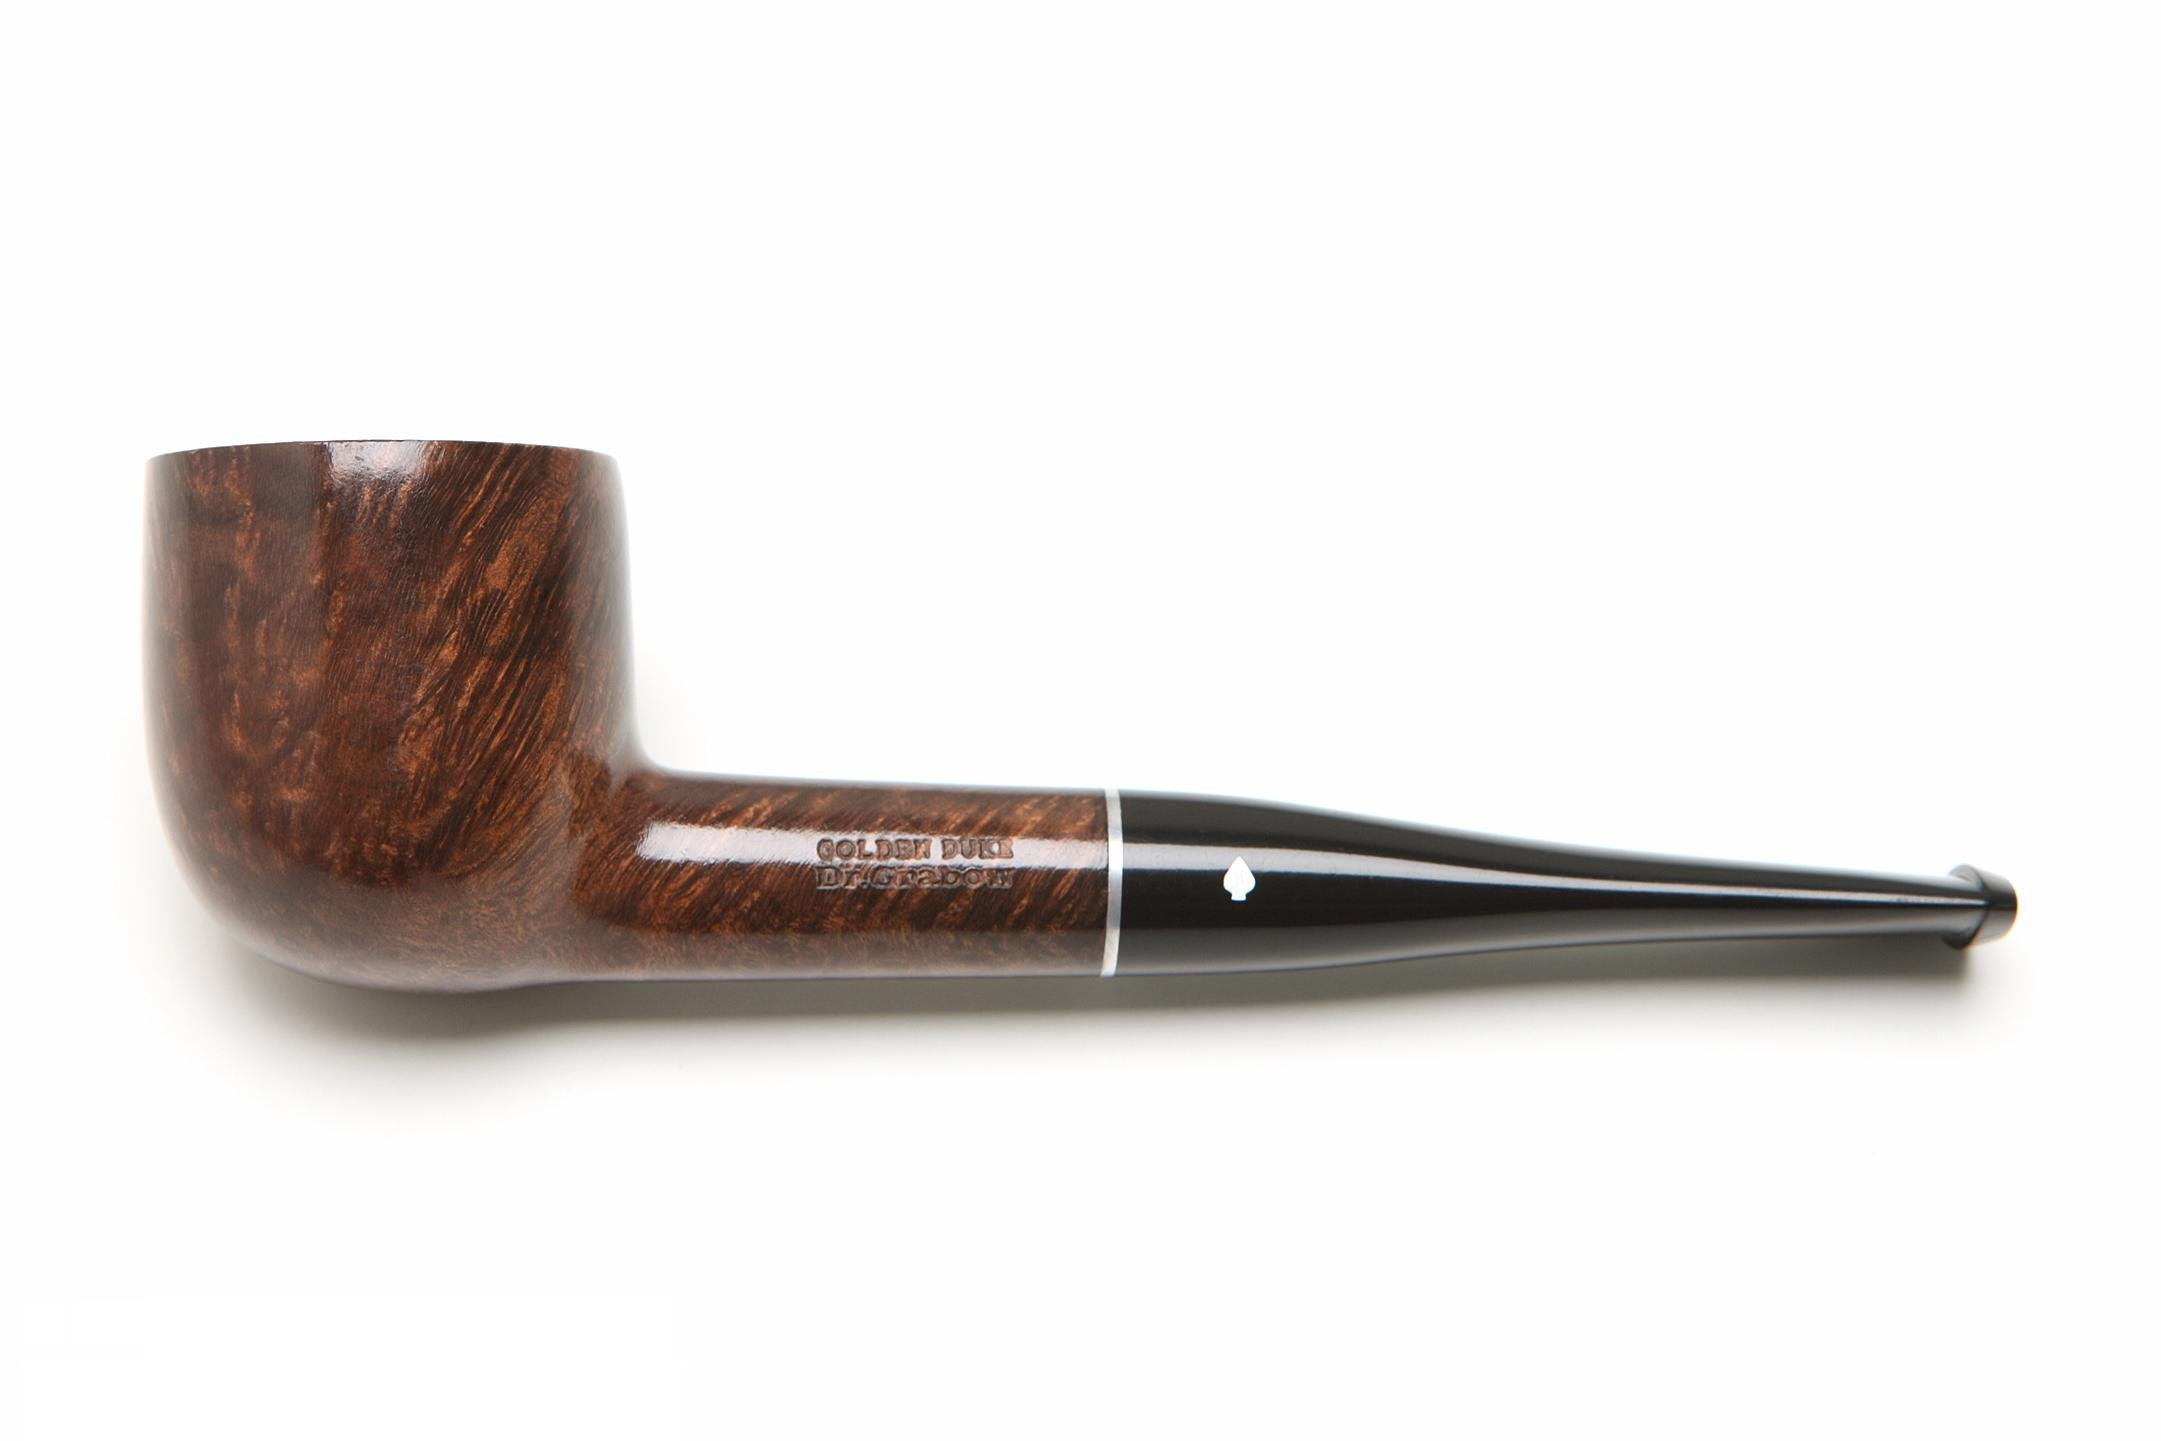 Vintage estate pipe dr grabow golden duke filtered pipe imported briar - Dr Grabow Golden Duke Smooth Tobacco Pipe